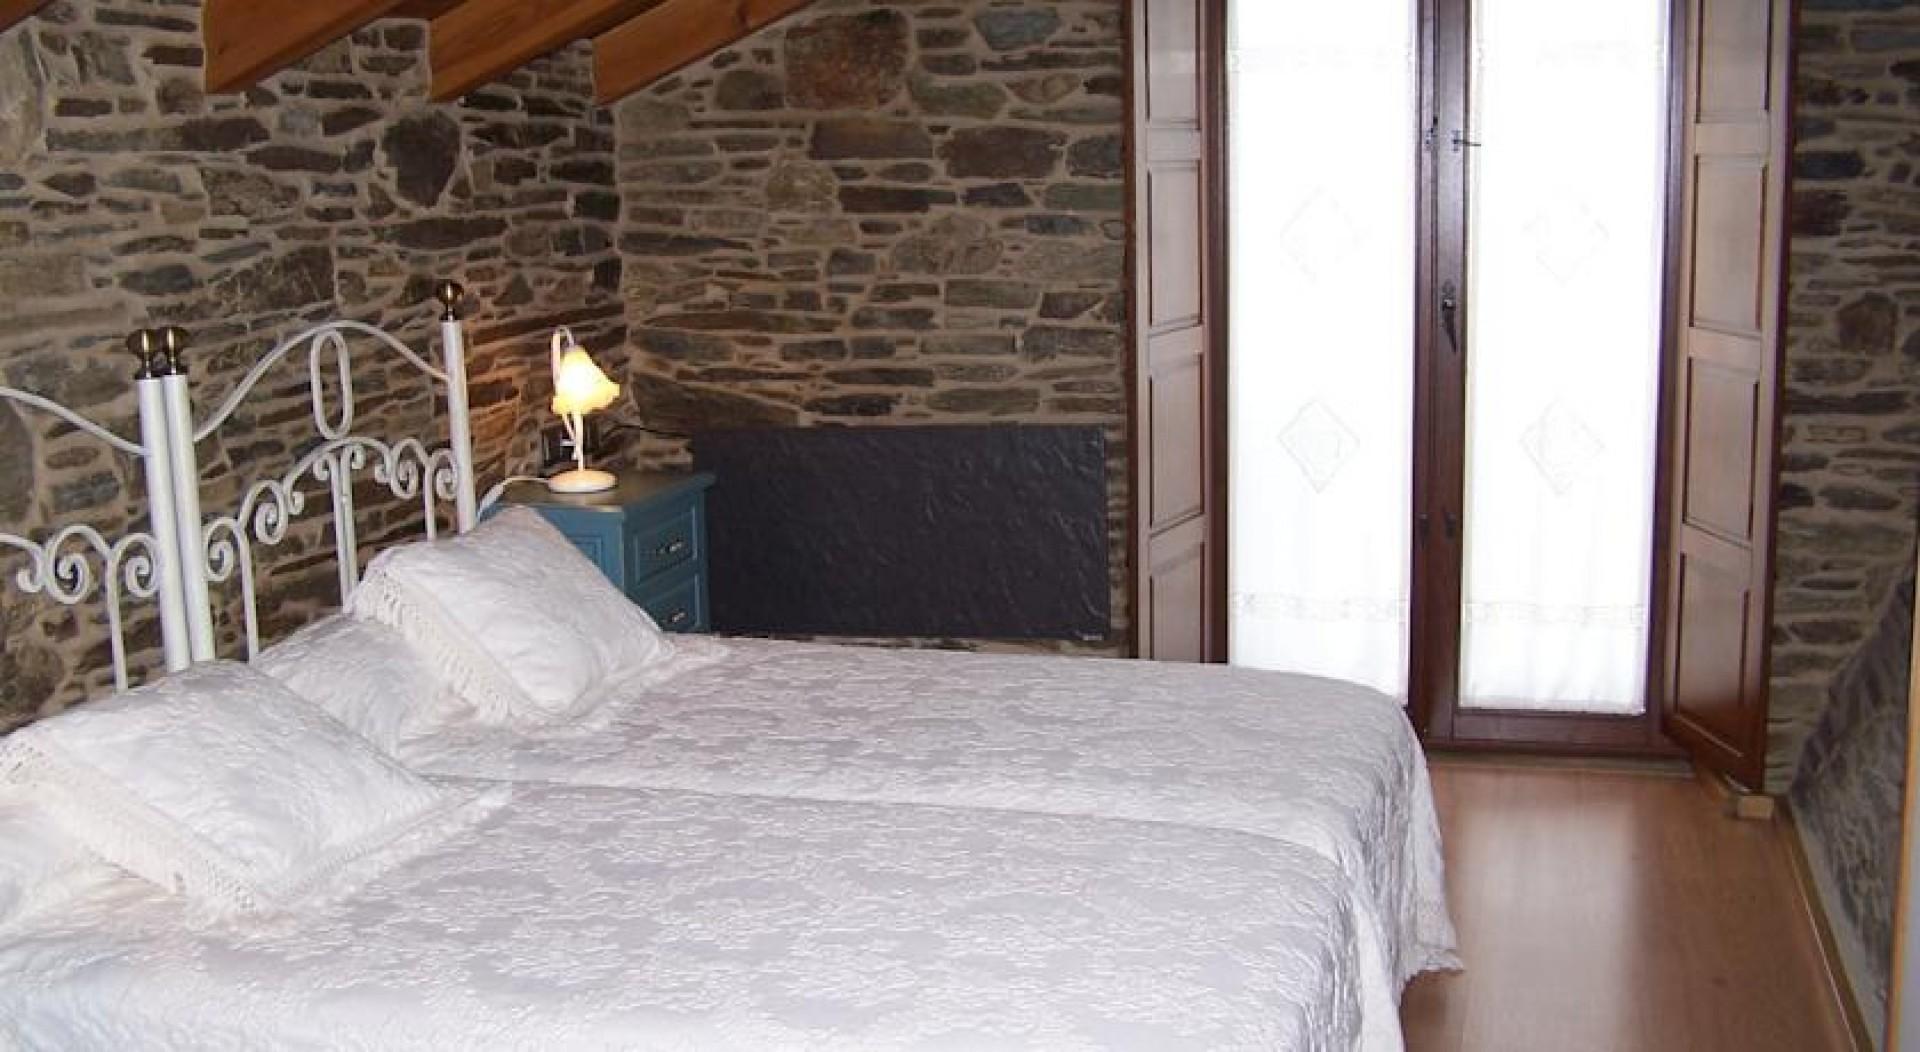 Ferrol to santiago de compostela charming hotels english way for Charming hotels